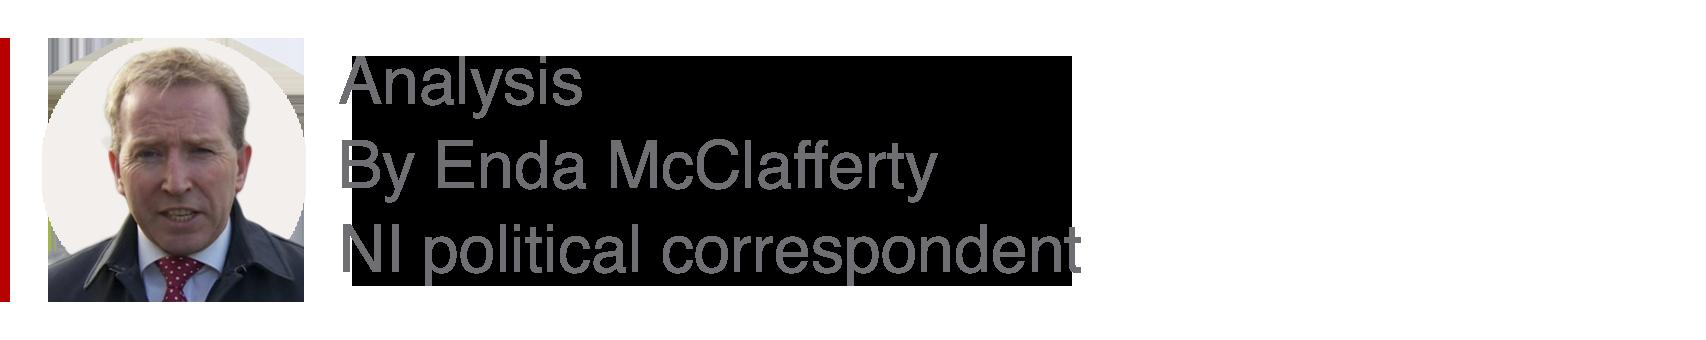 Analysis box by Enda McClafferty, NI political correspondent